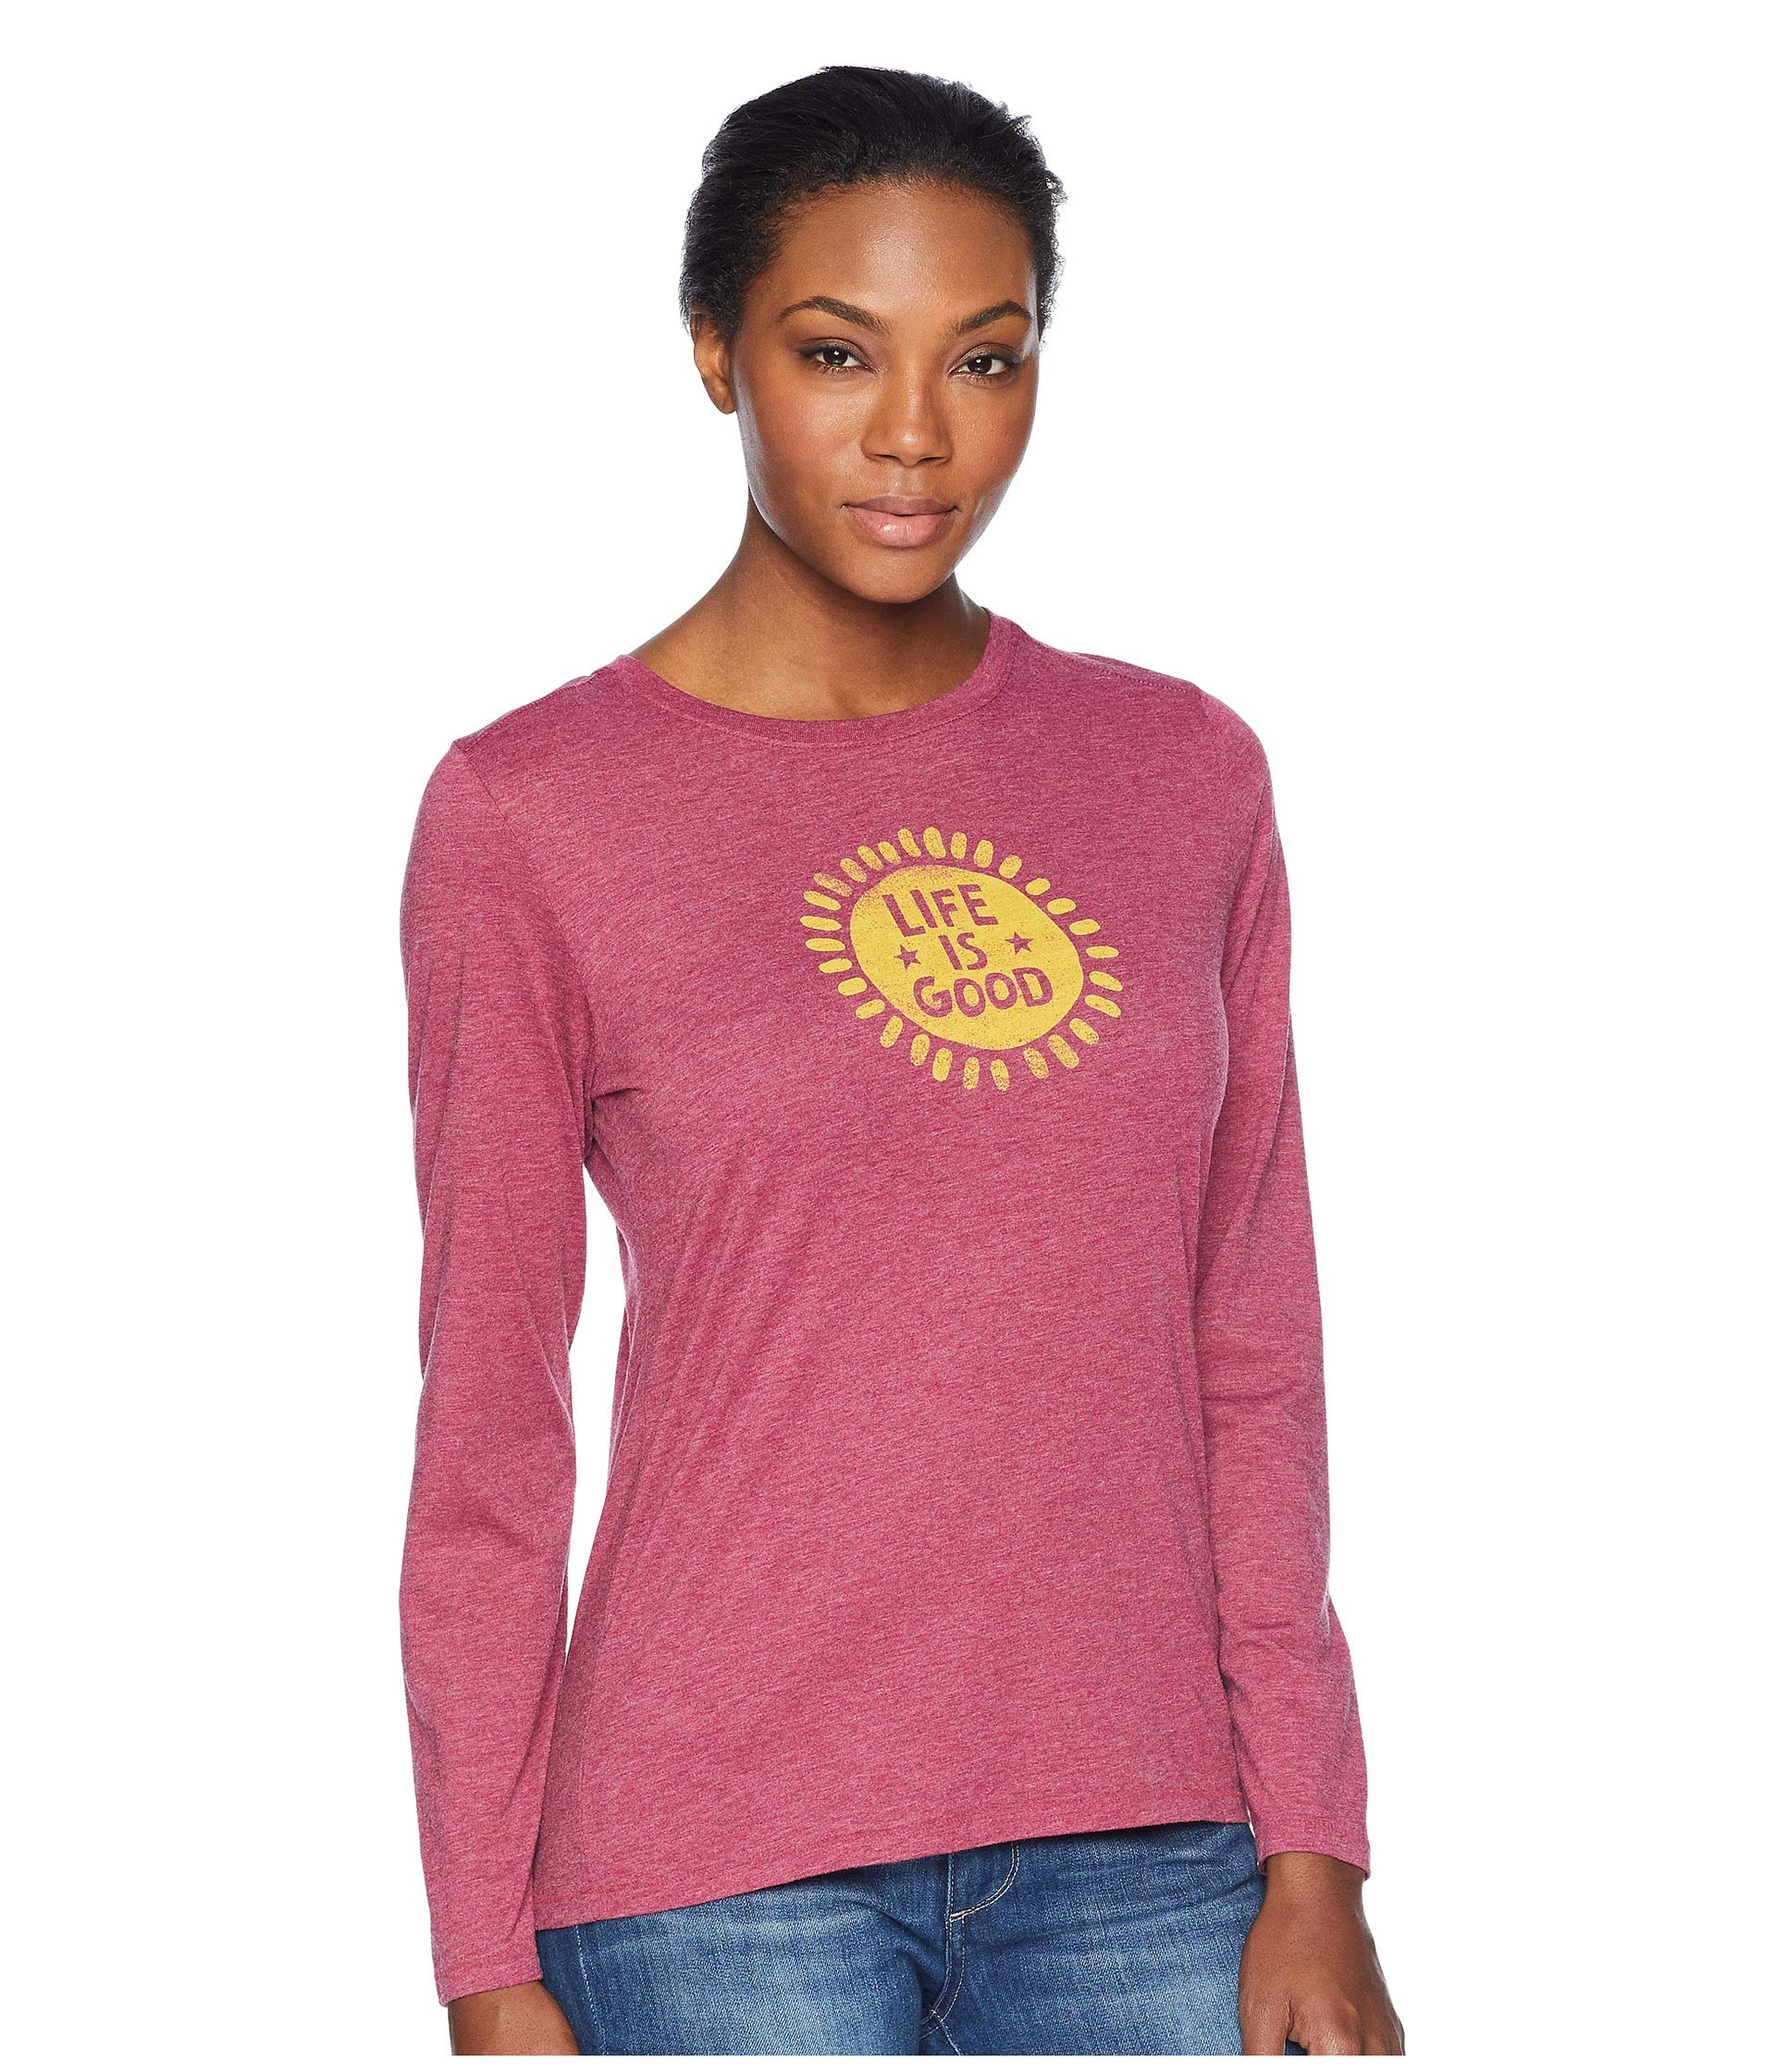 Cool Sun Is T Life Starry Good Cherry shirt Wild Long Sleeve ISqIw47C